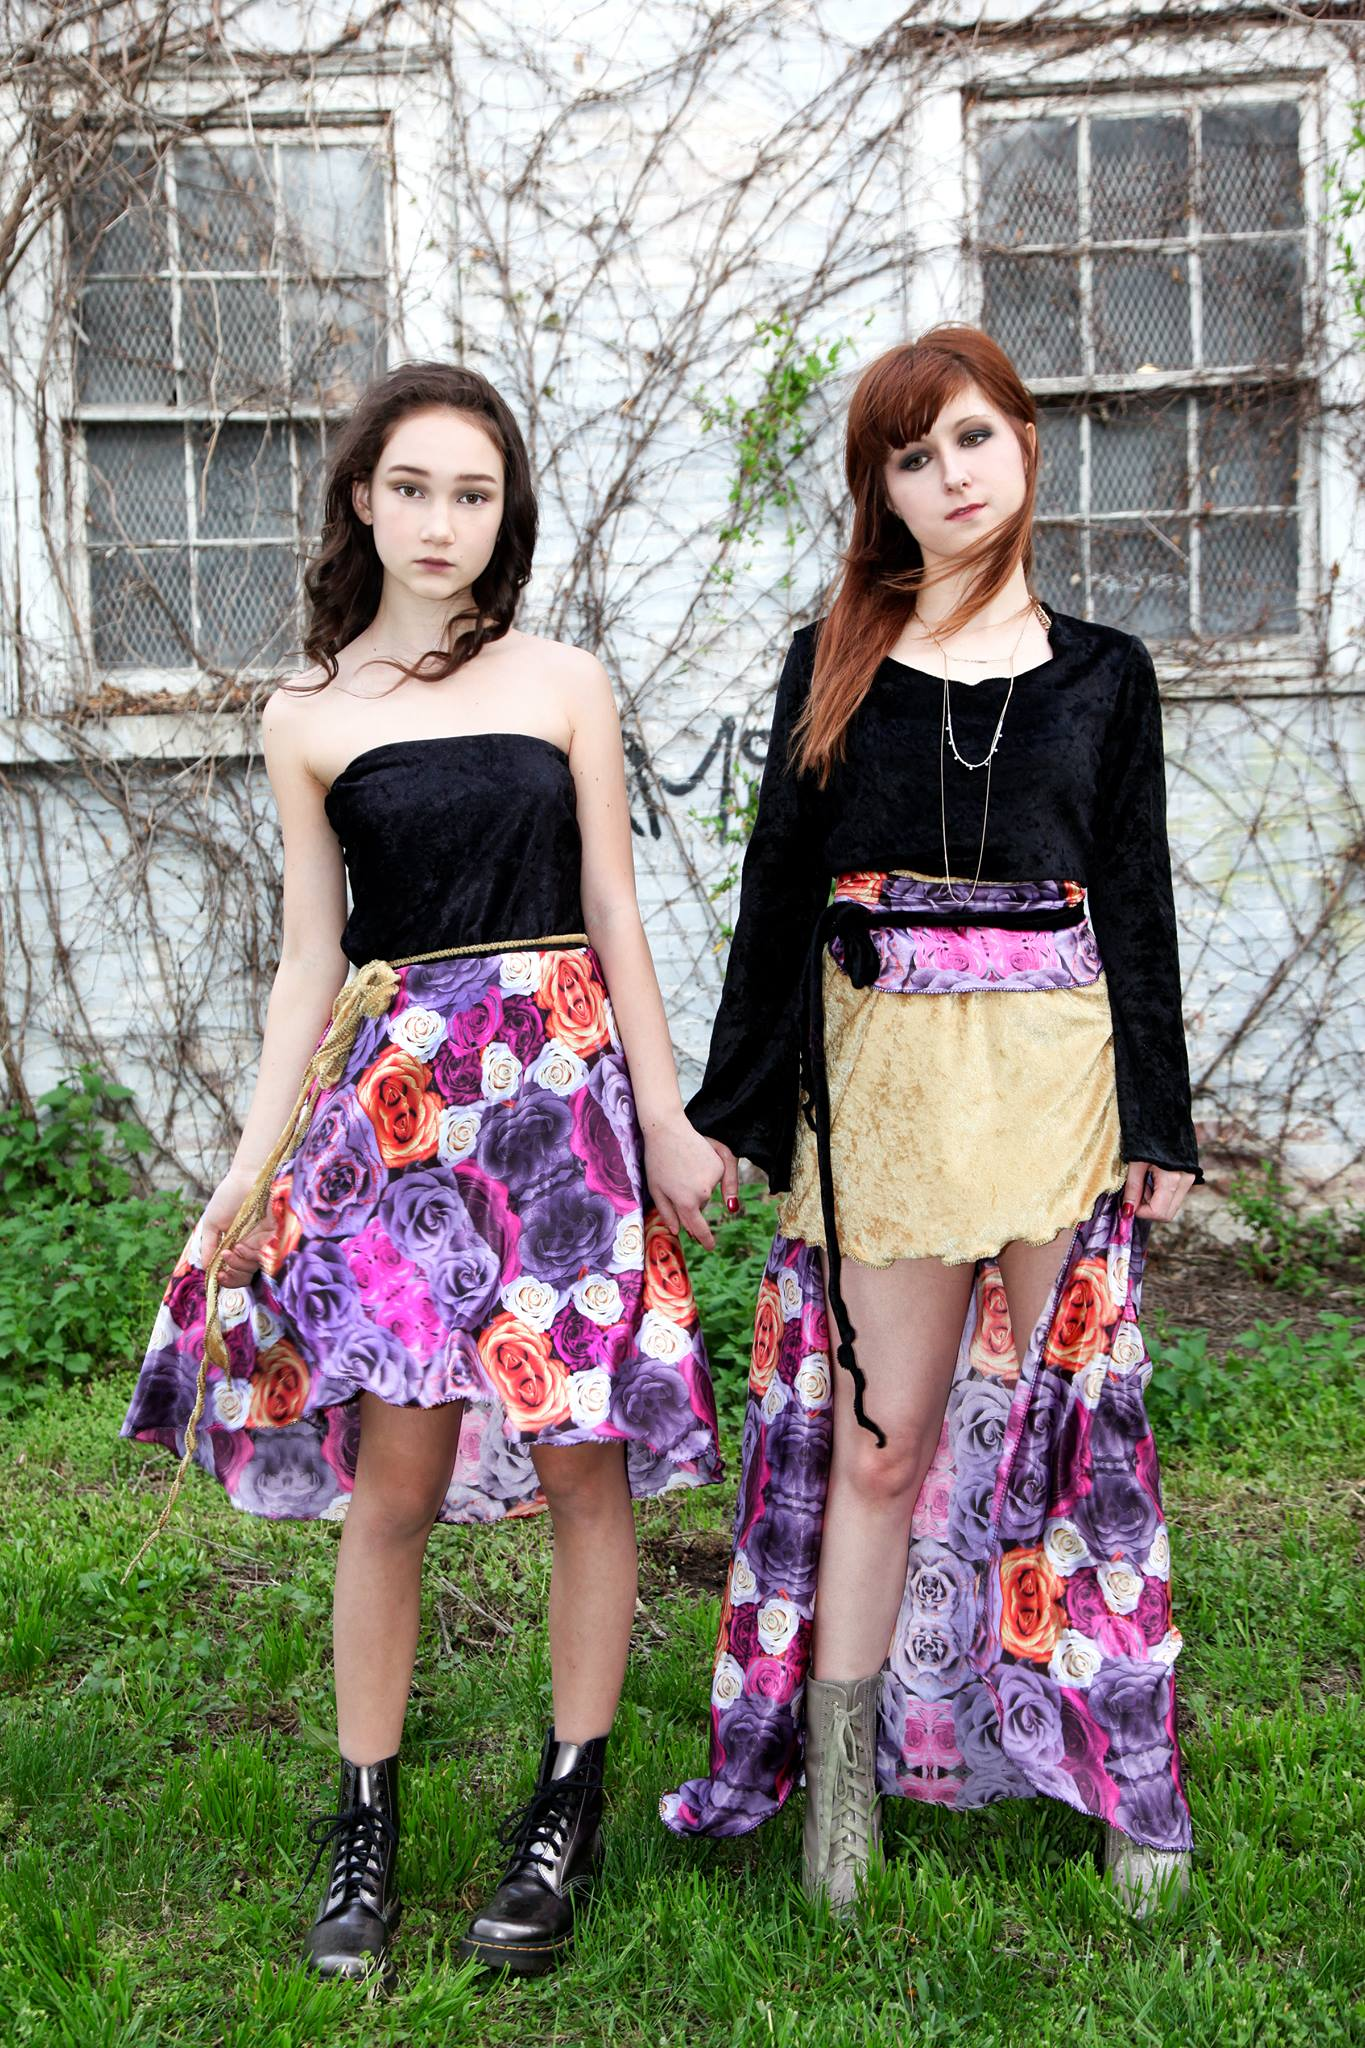 models Aislin Freya Pax , Victoria Rae  Stewart O'Shields